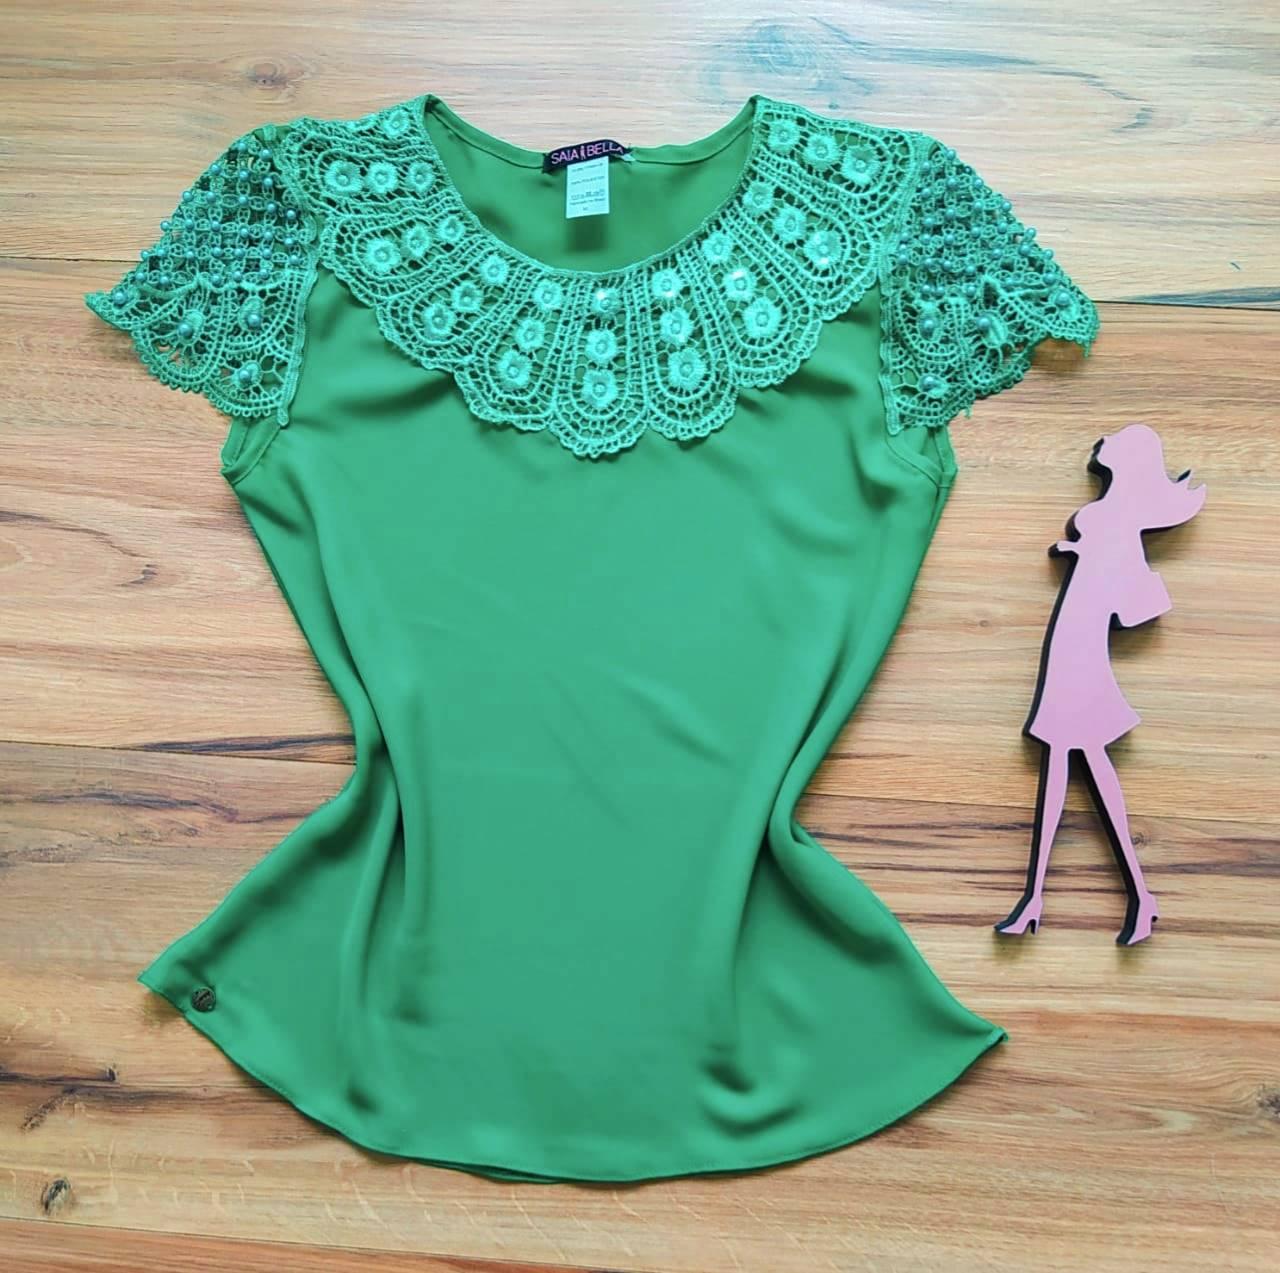 Blusa Fiorella de Renda Saia Bella - SB79902 Verde